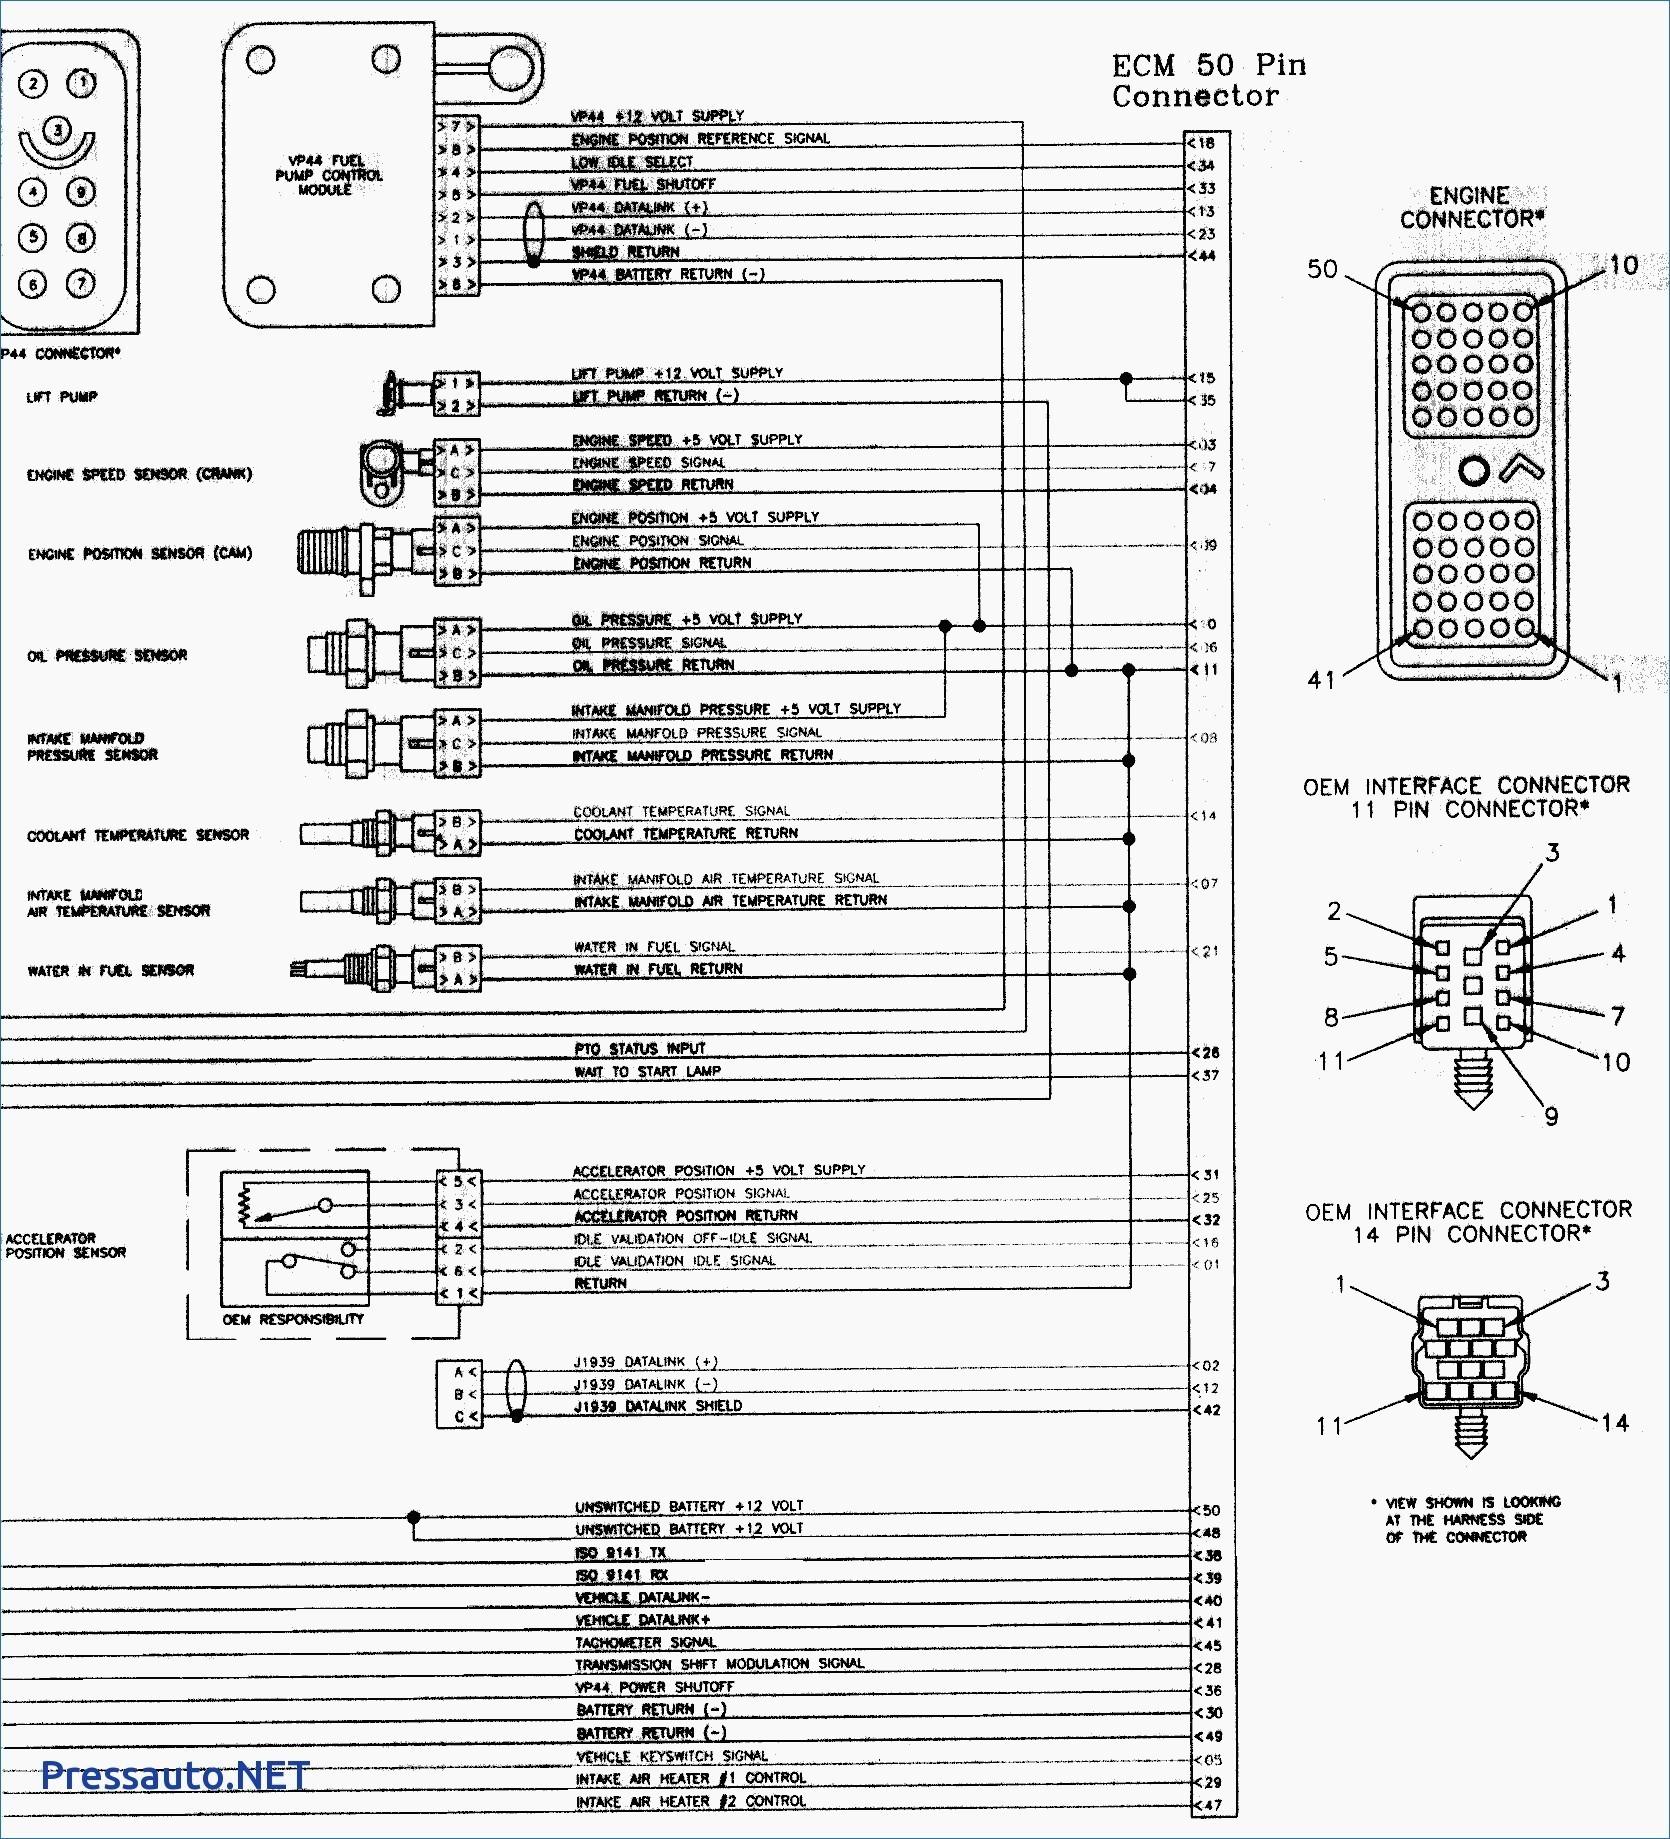 1995 Dodge Ram 1500 Transmission Wiring Diagram Refrence 2001 Dodge Ram 1500 Trailer Wiring Diagram Save